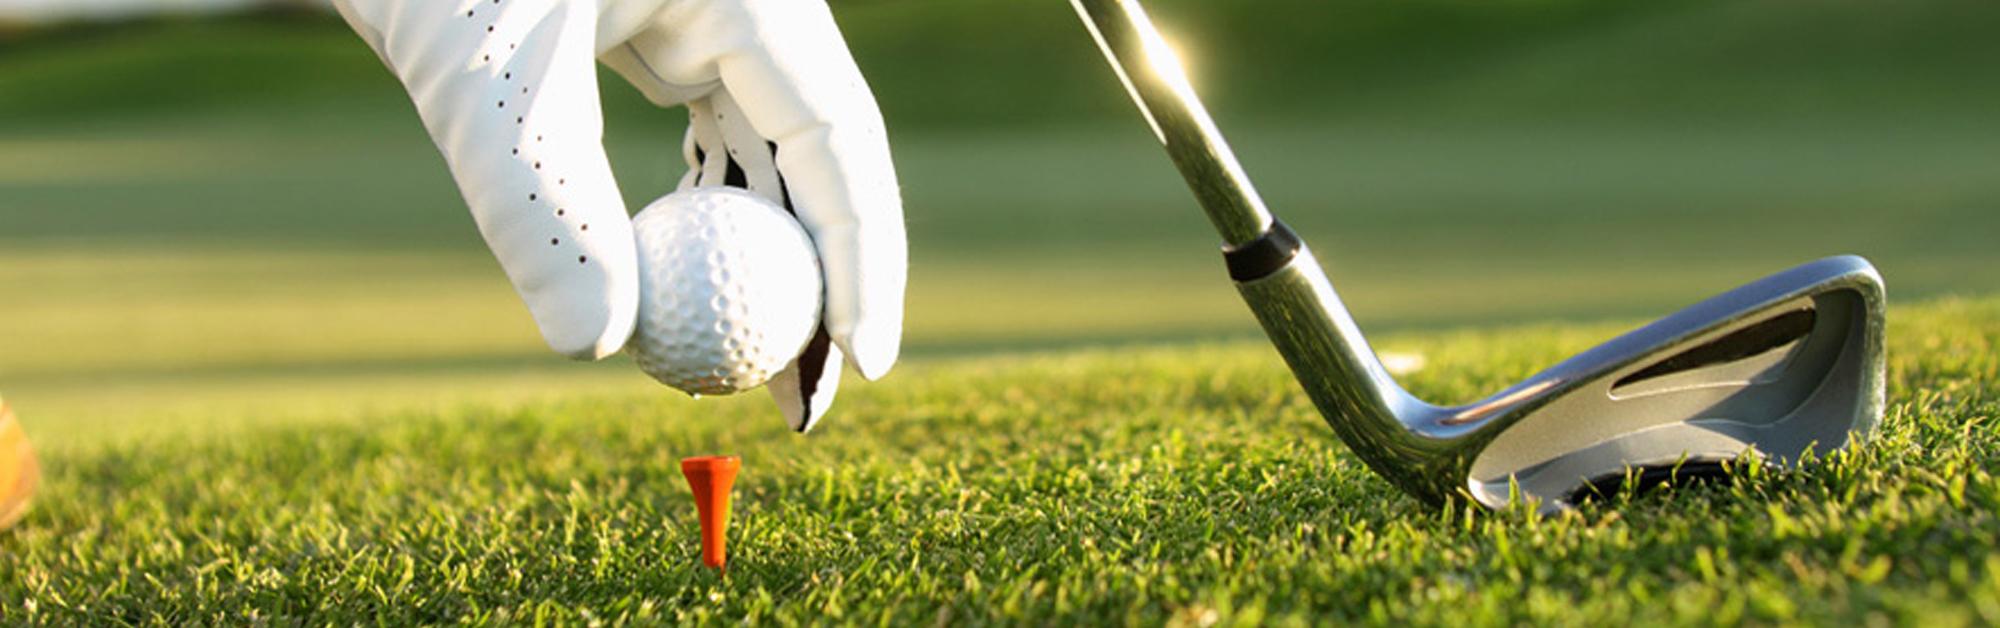 golfing_banner_image